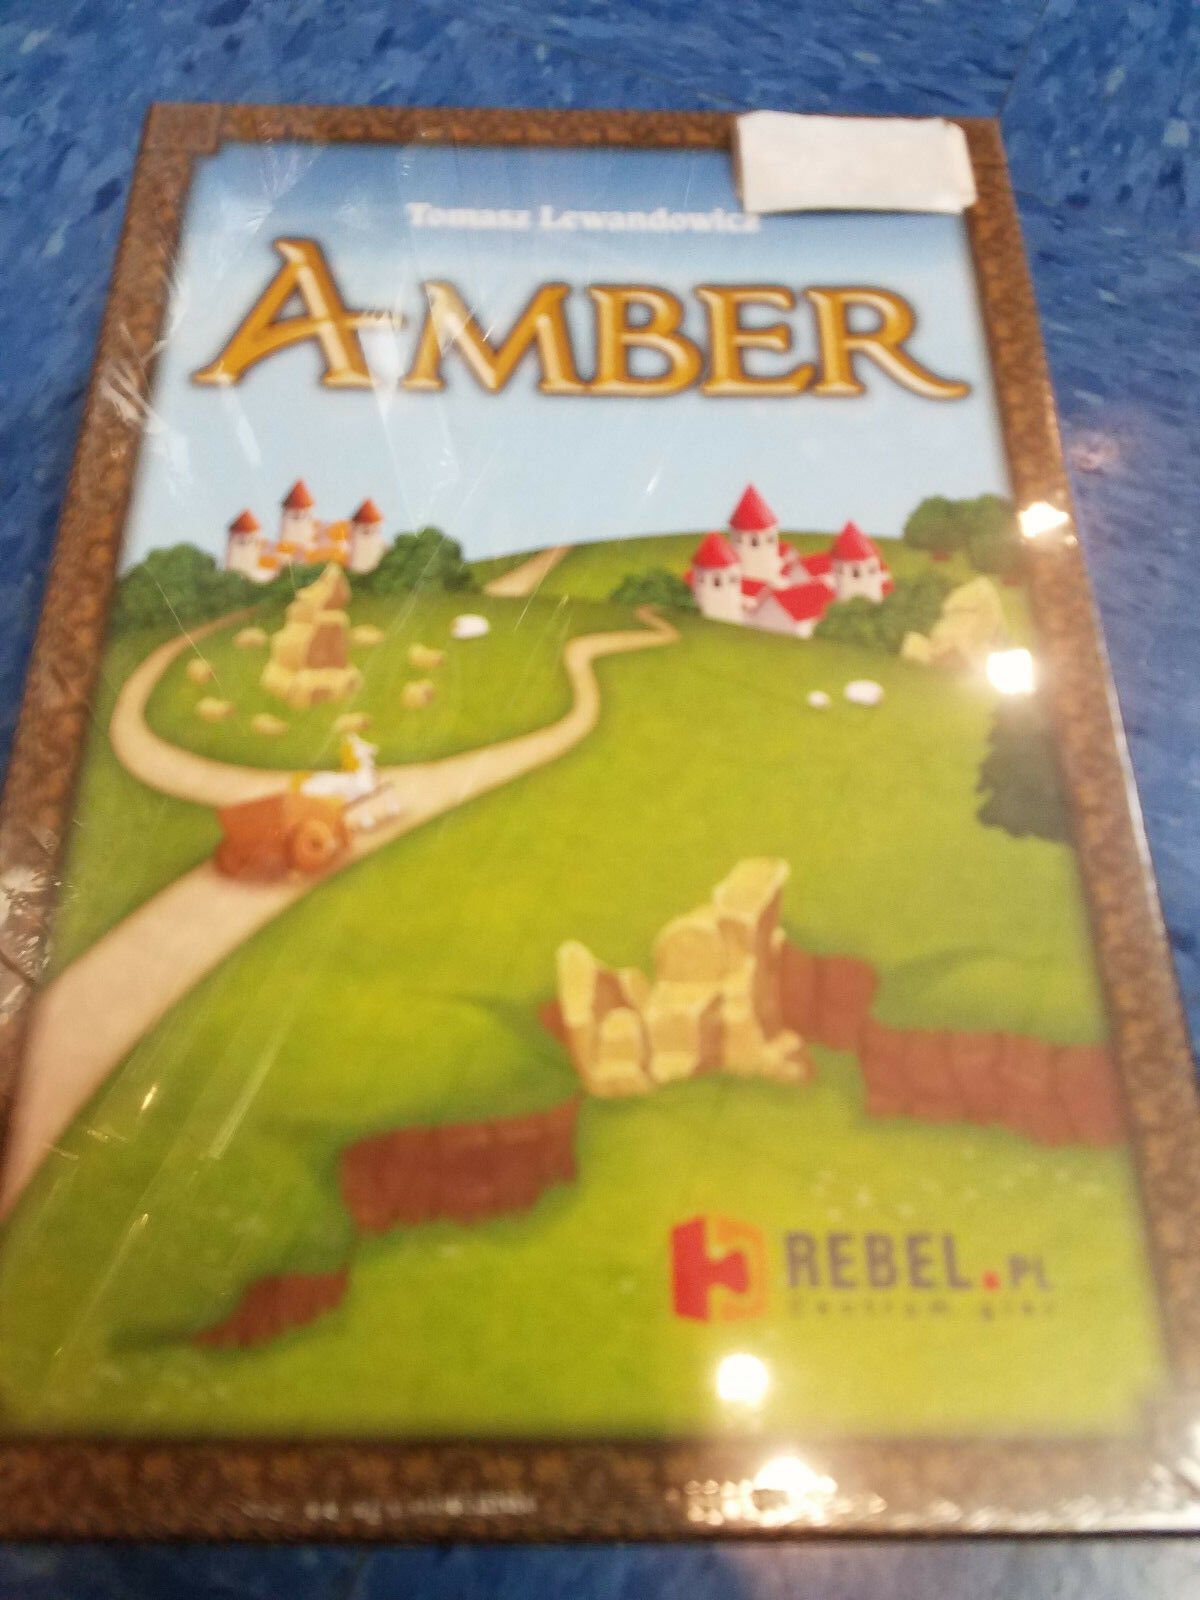 Amber - Rebel Games Board Game Game Game New 19e876